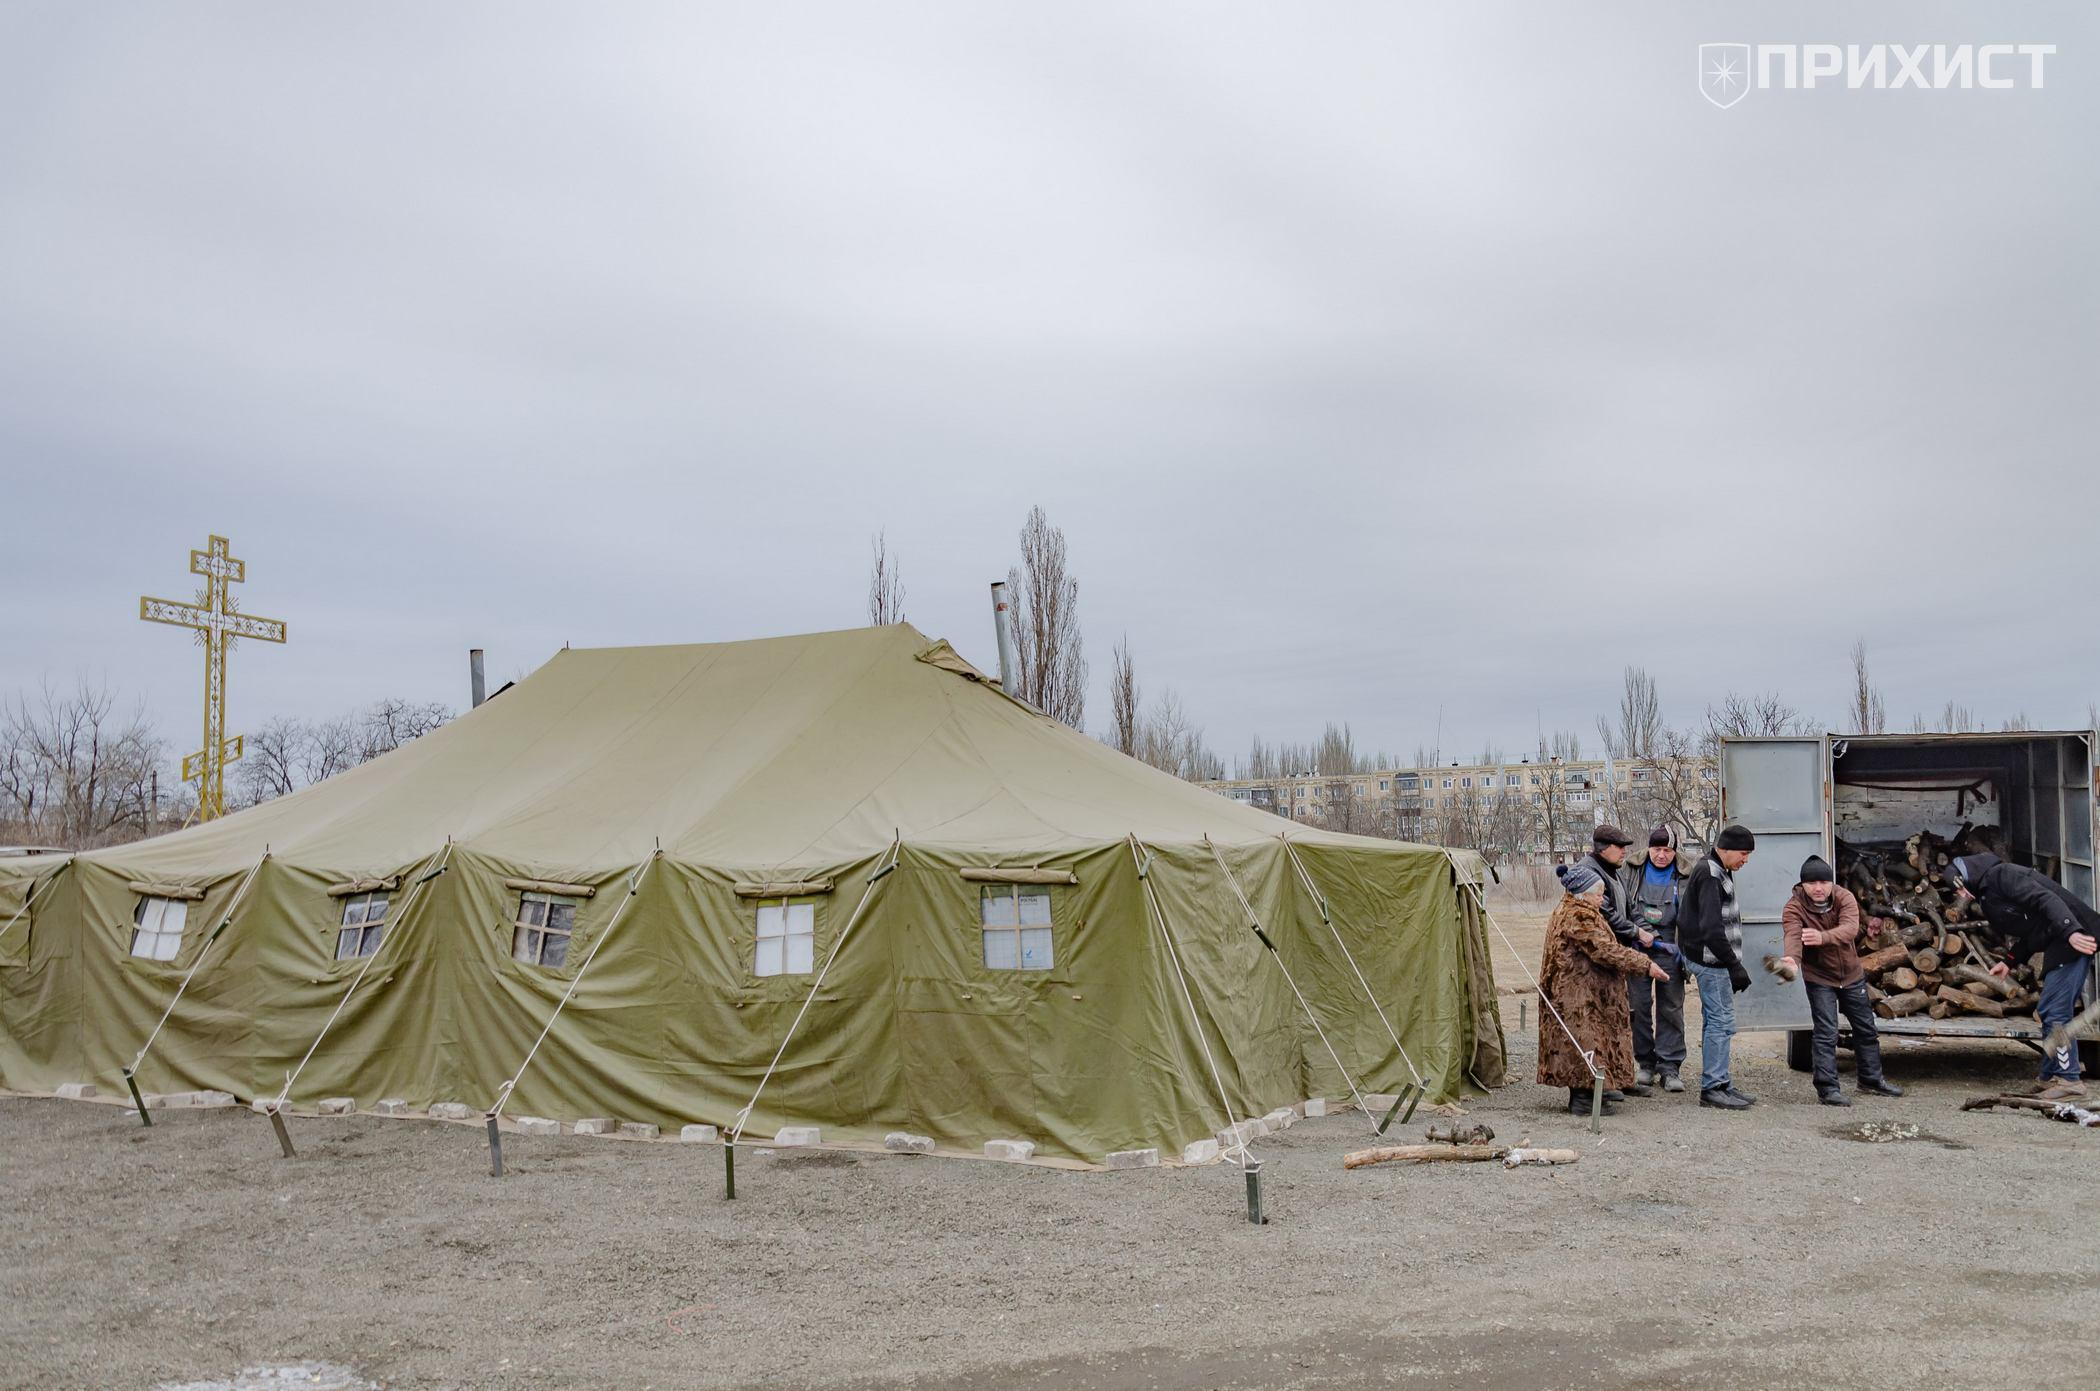 УПЦ установила пункт обогрева напротив горисполкома | Прихист